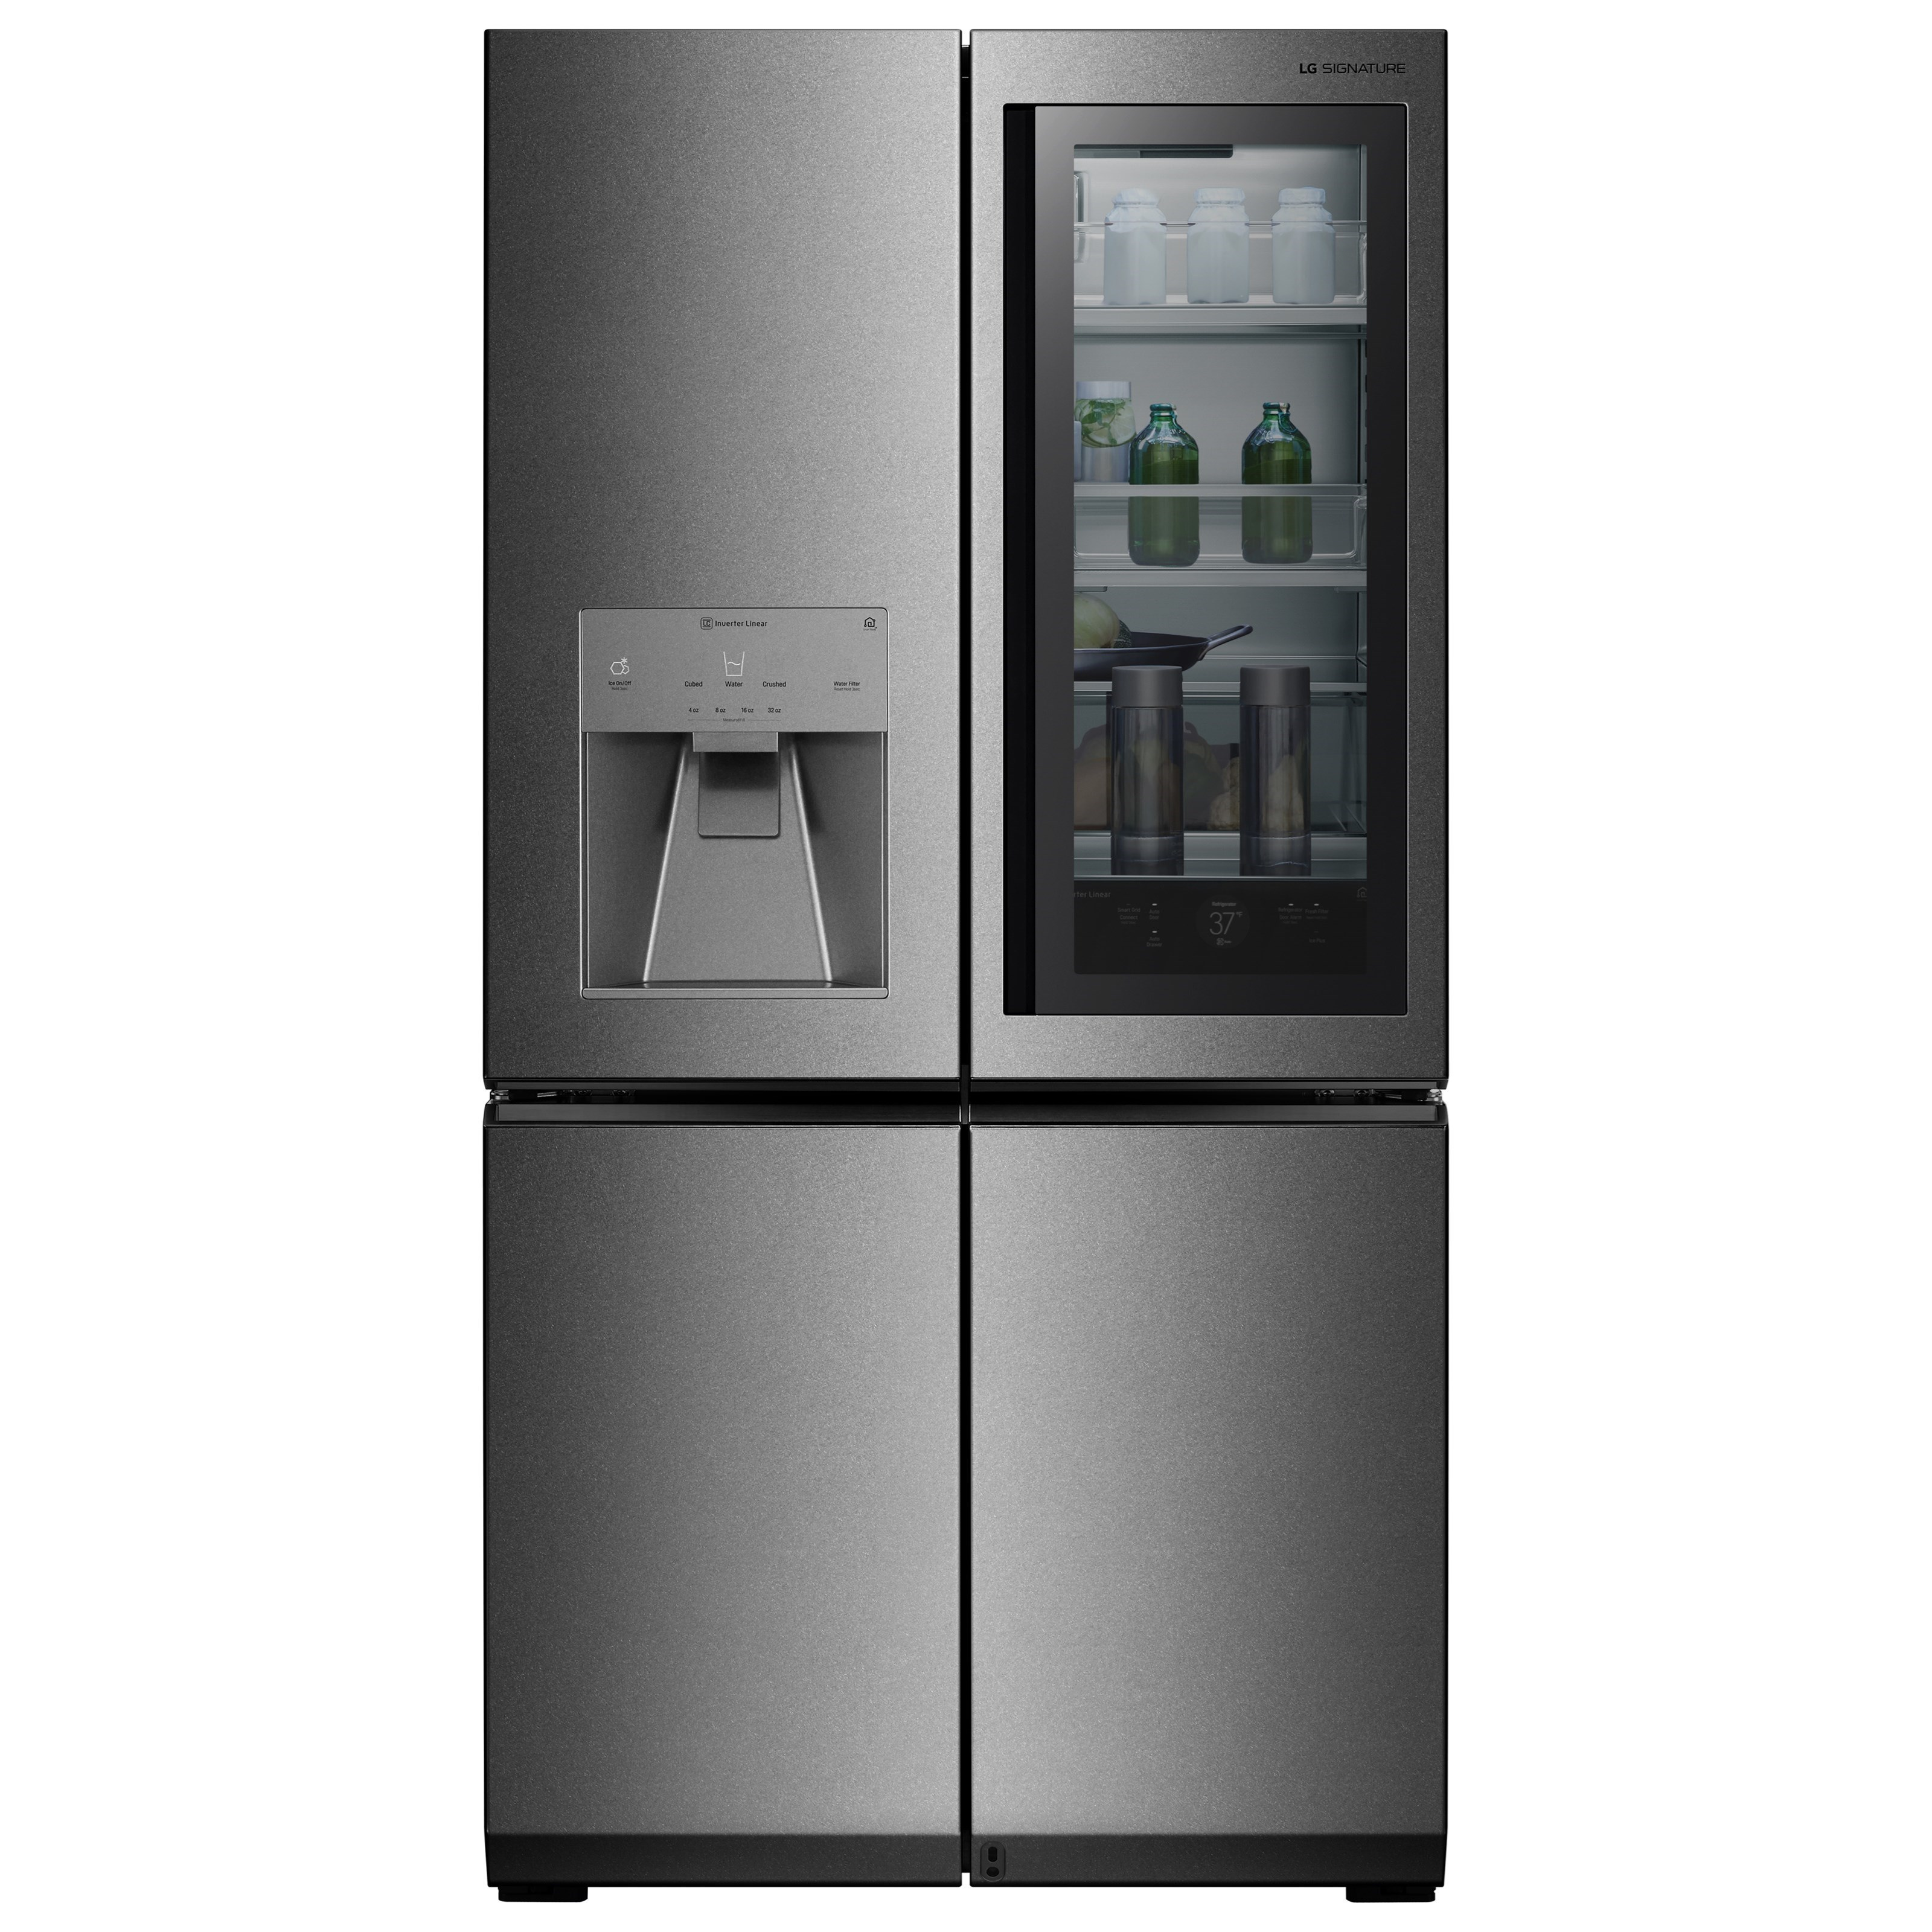 display bakery glass refrigerator case vollrath deli countertop cubed